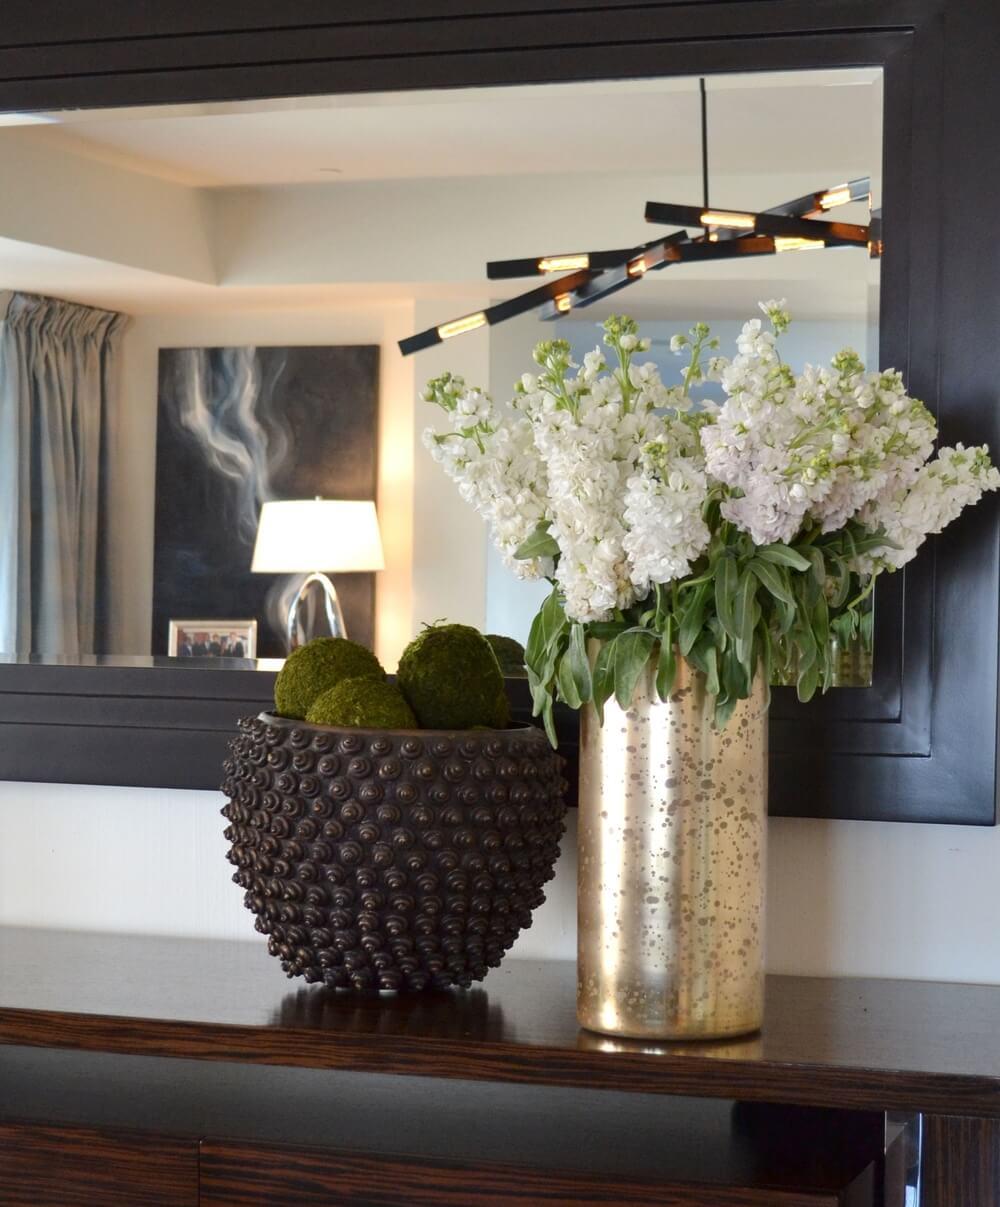 elizabeth-tapper-interiors-mulholland-hip-dining-room-details-console.jpg